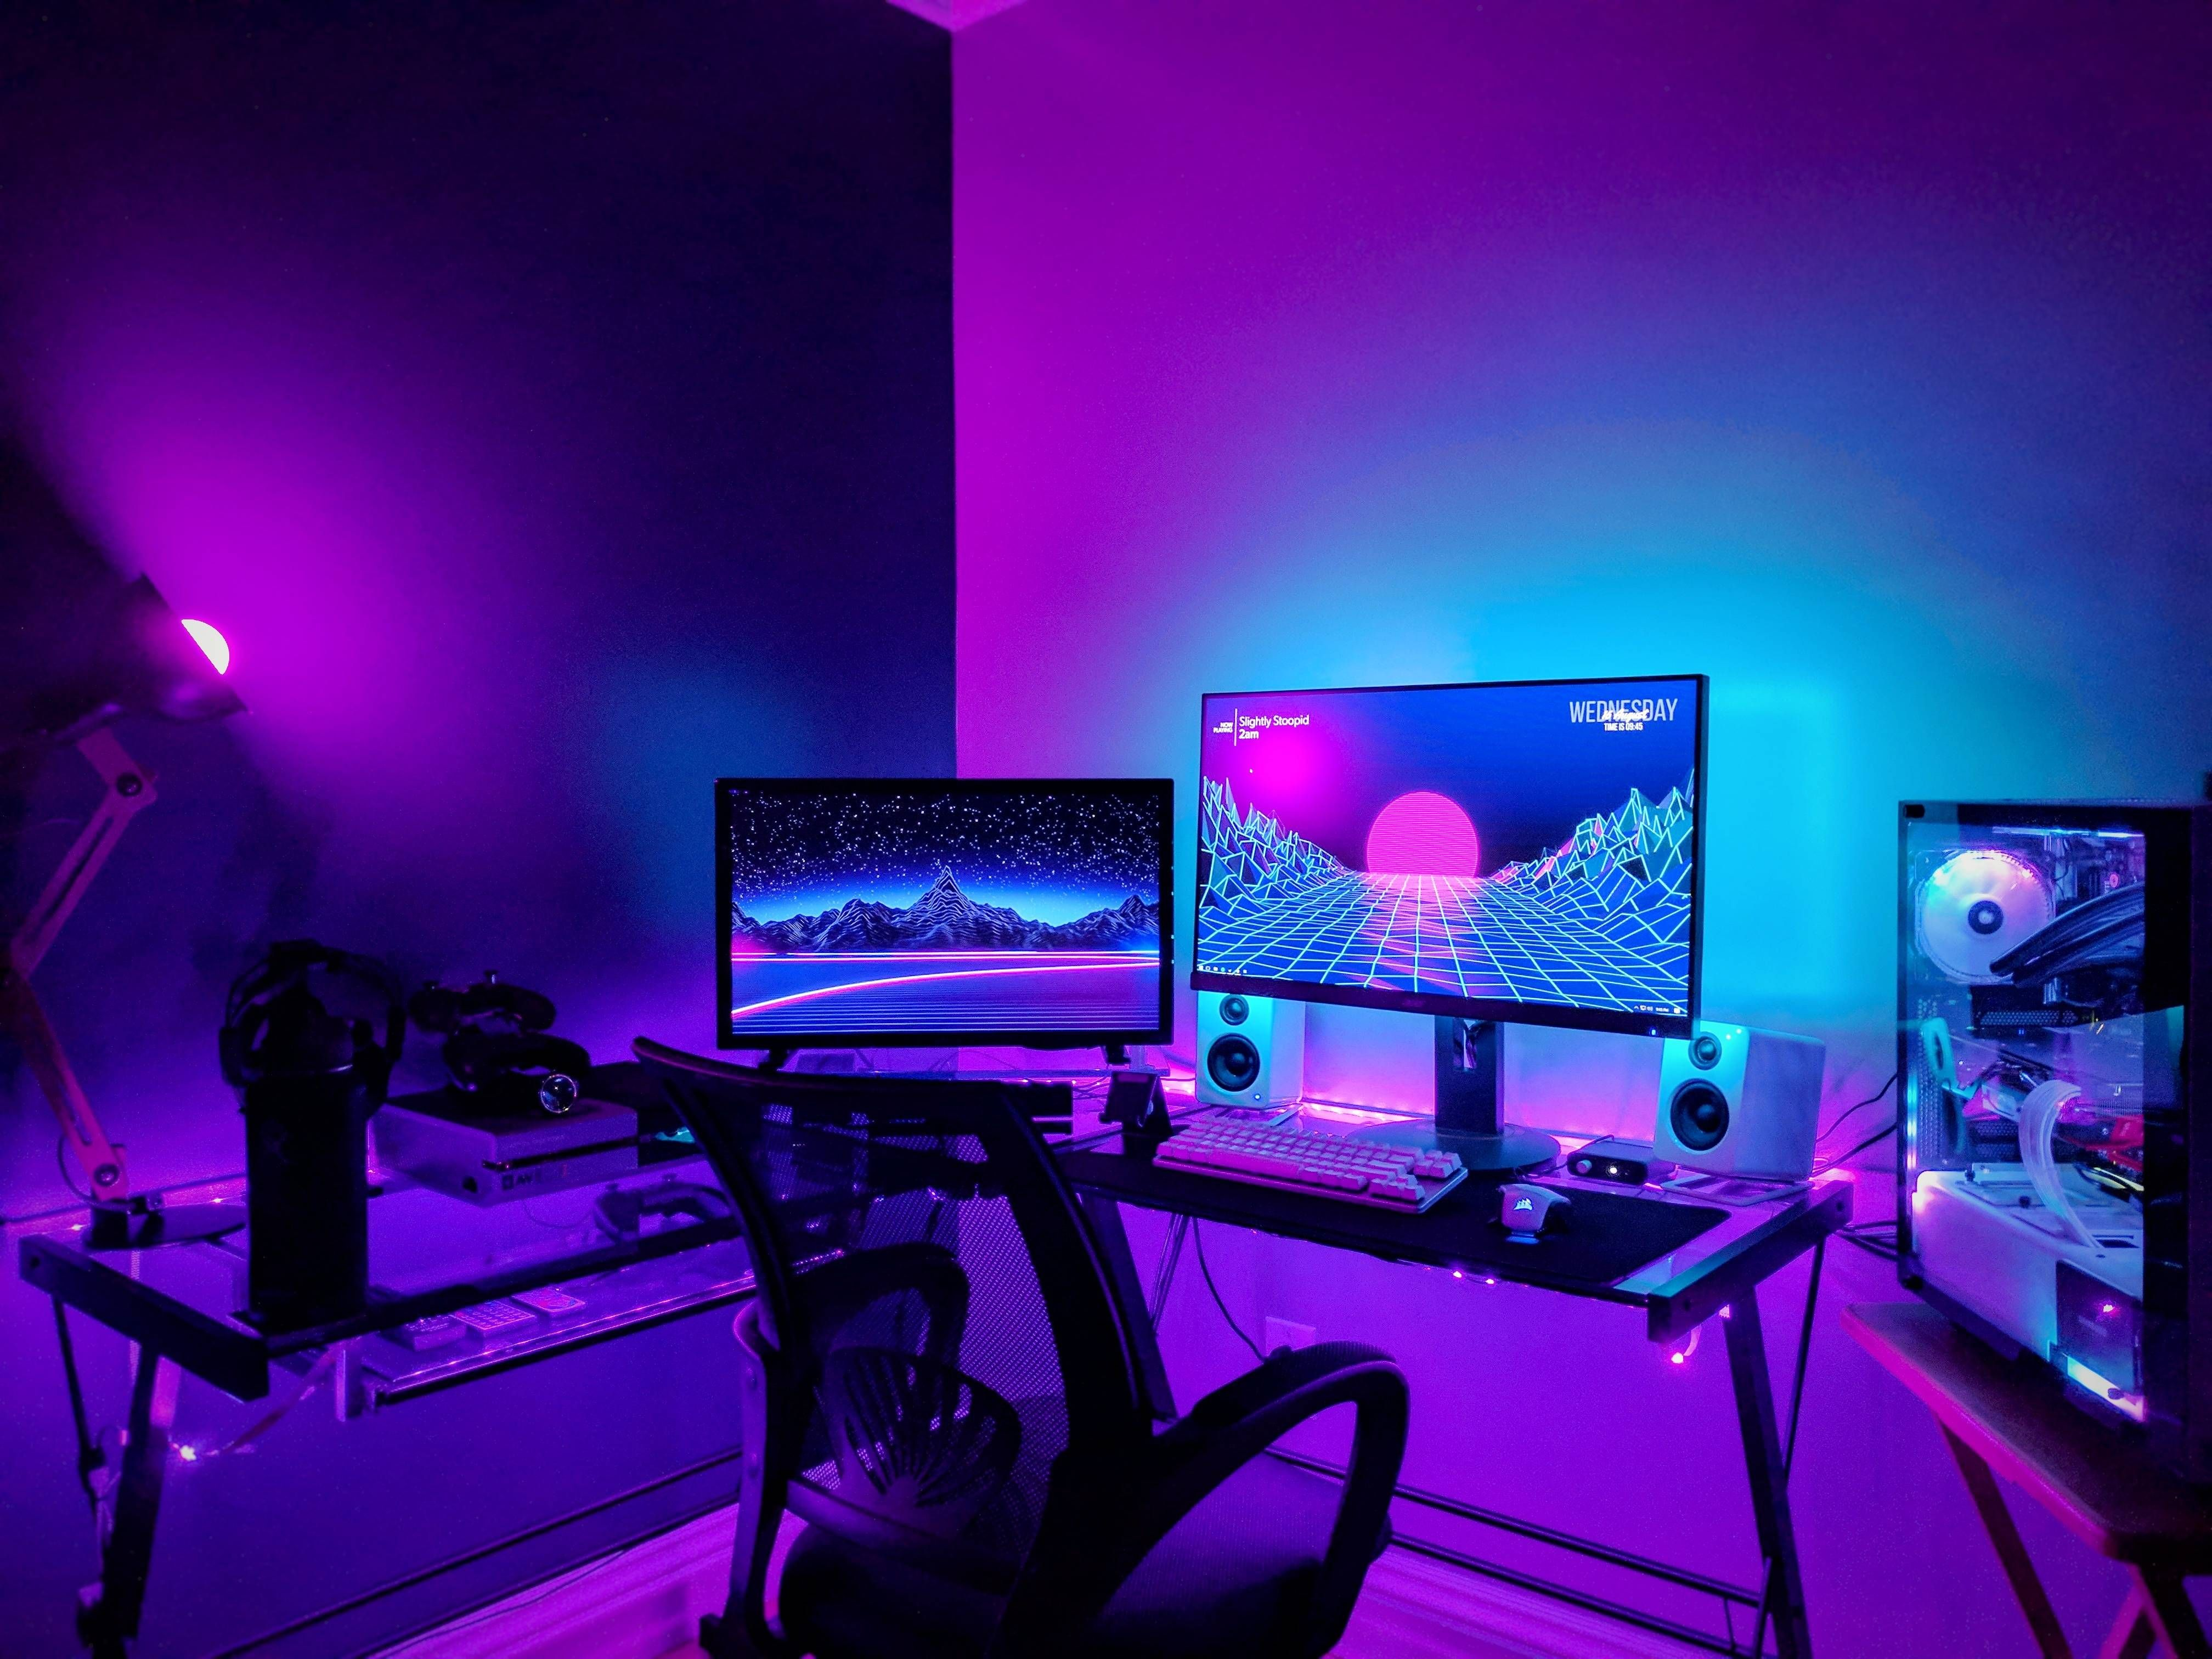 Pin by pizdabolka on IT-theme | Diy computer desk, Gaming room setup, Pc  setup